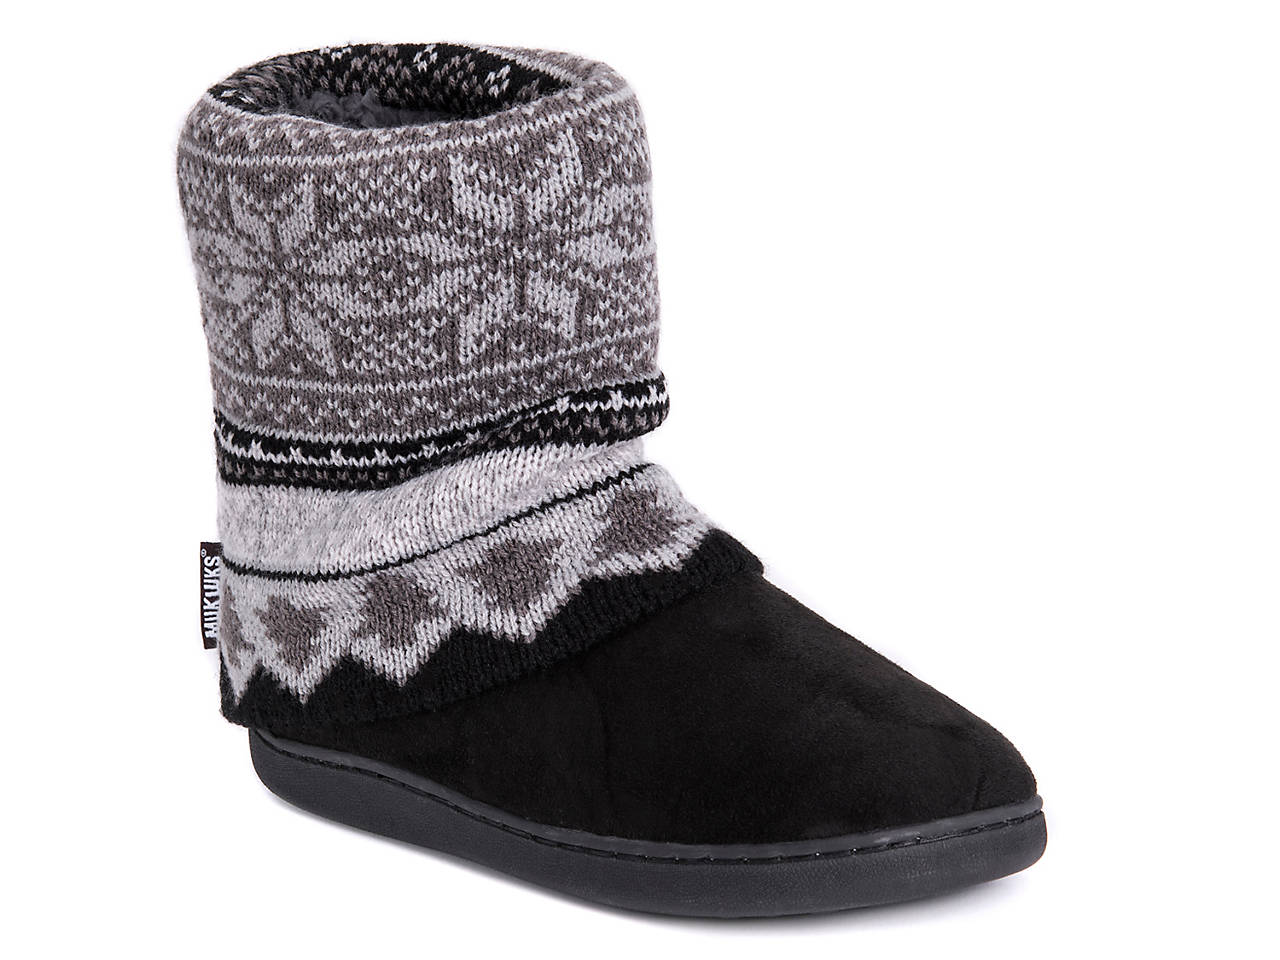 e8fd1583ea8f Muk Luks Raquel Bootie Slipper Women s Shoes